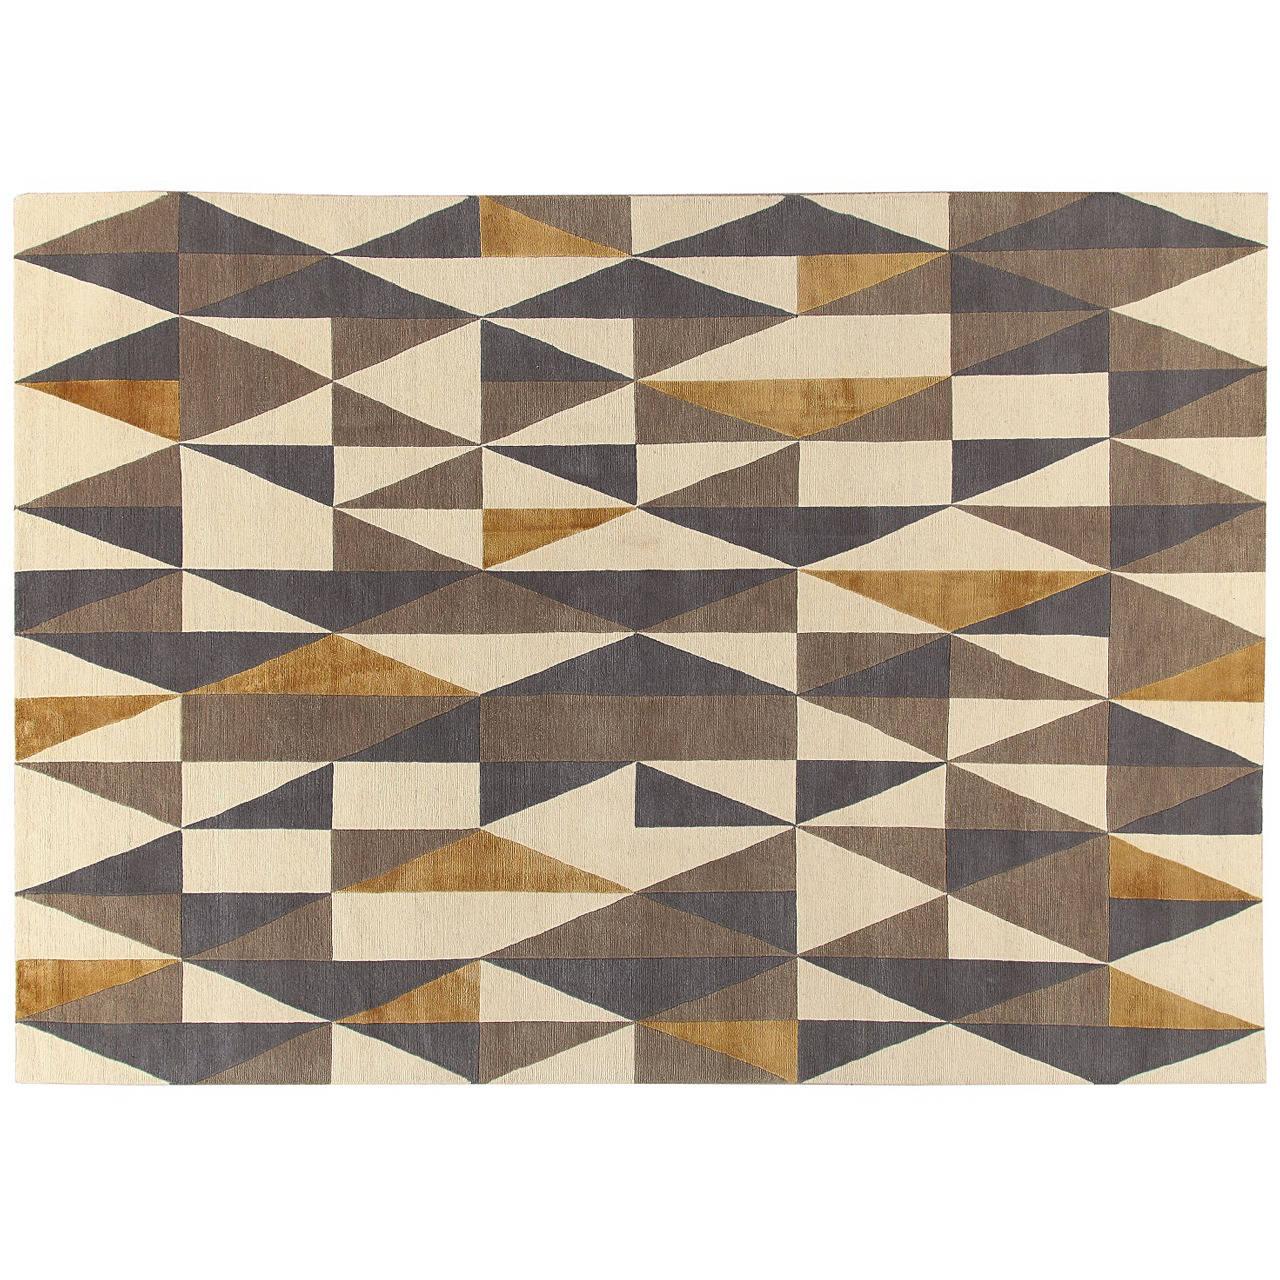 Carpet rugs diamantina gio ponti carpet collection for sale XOZWMRJ